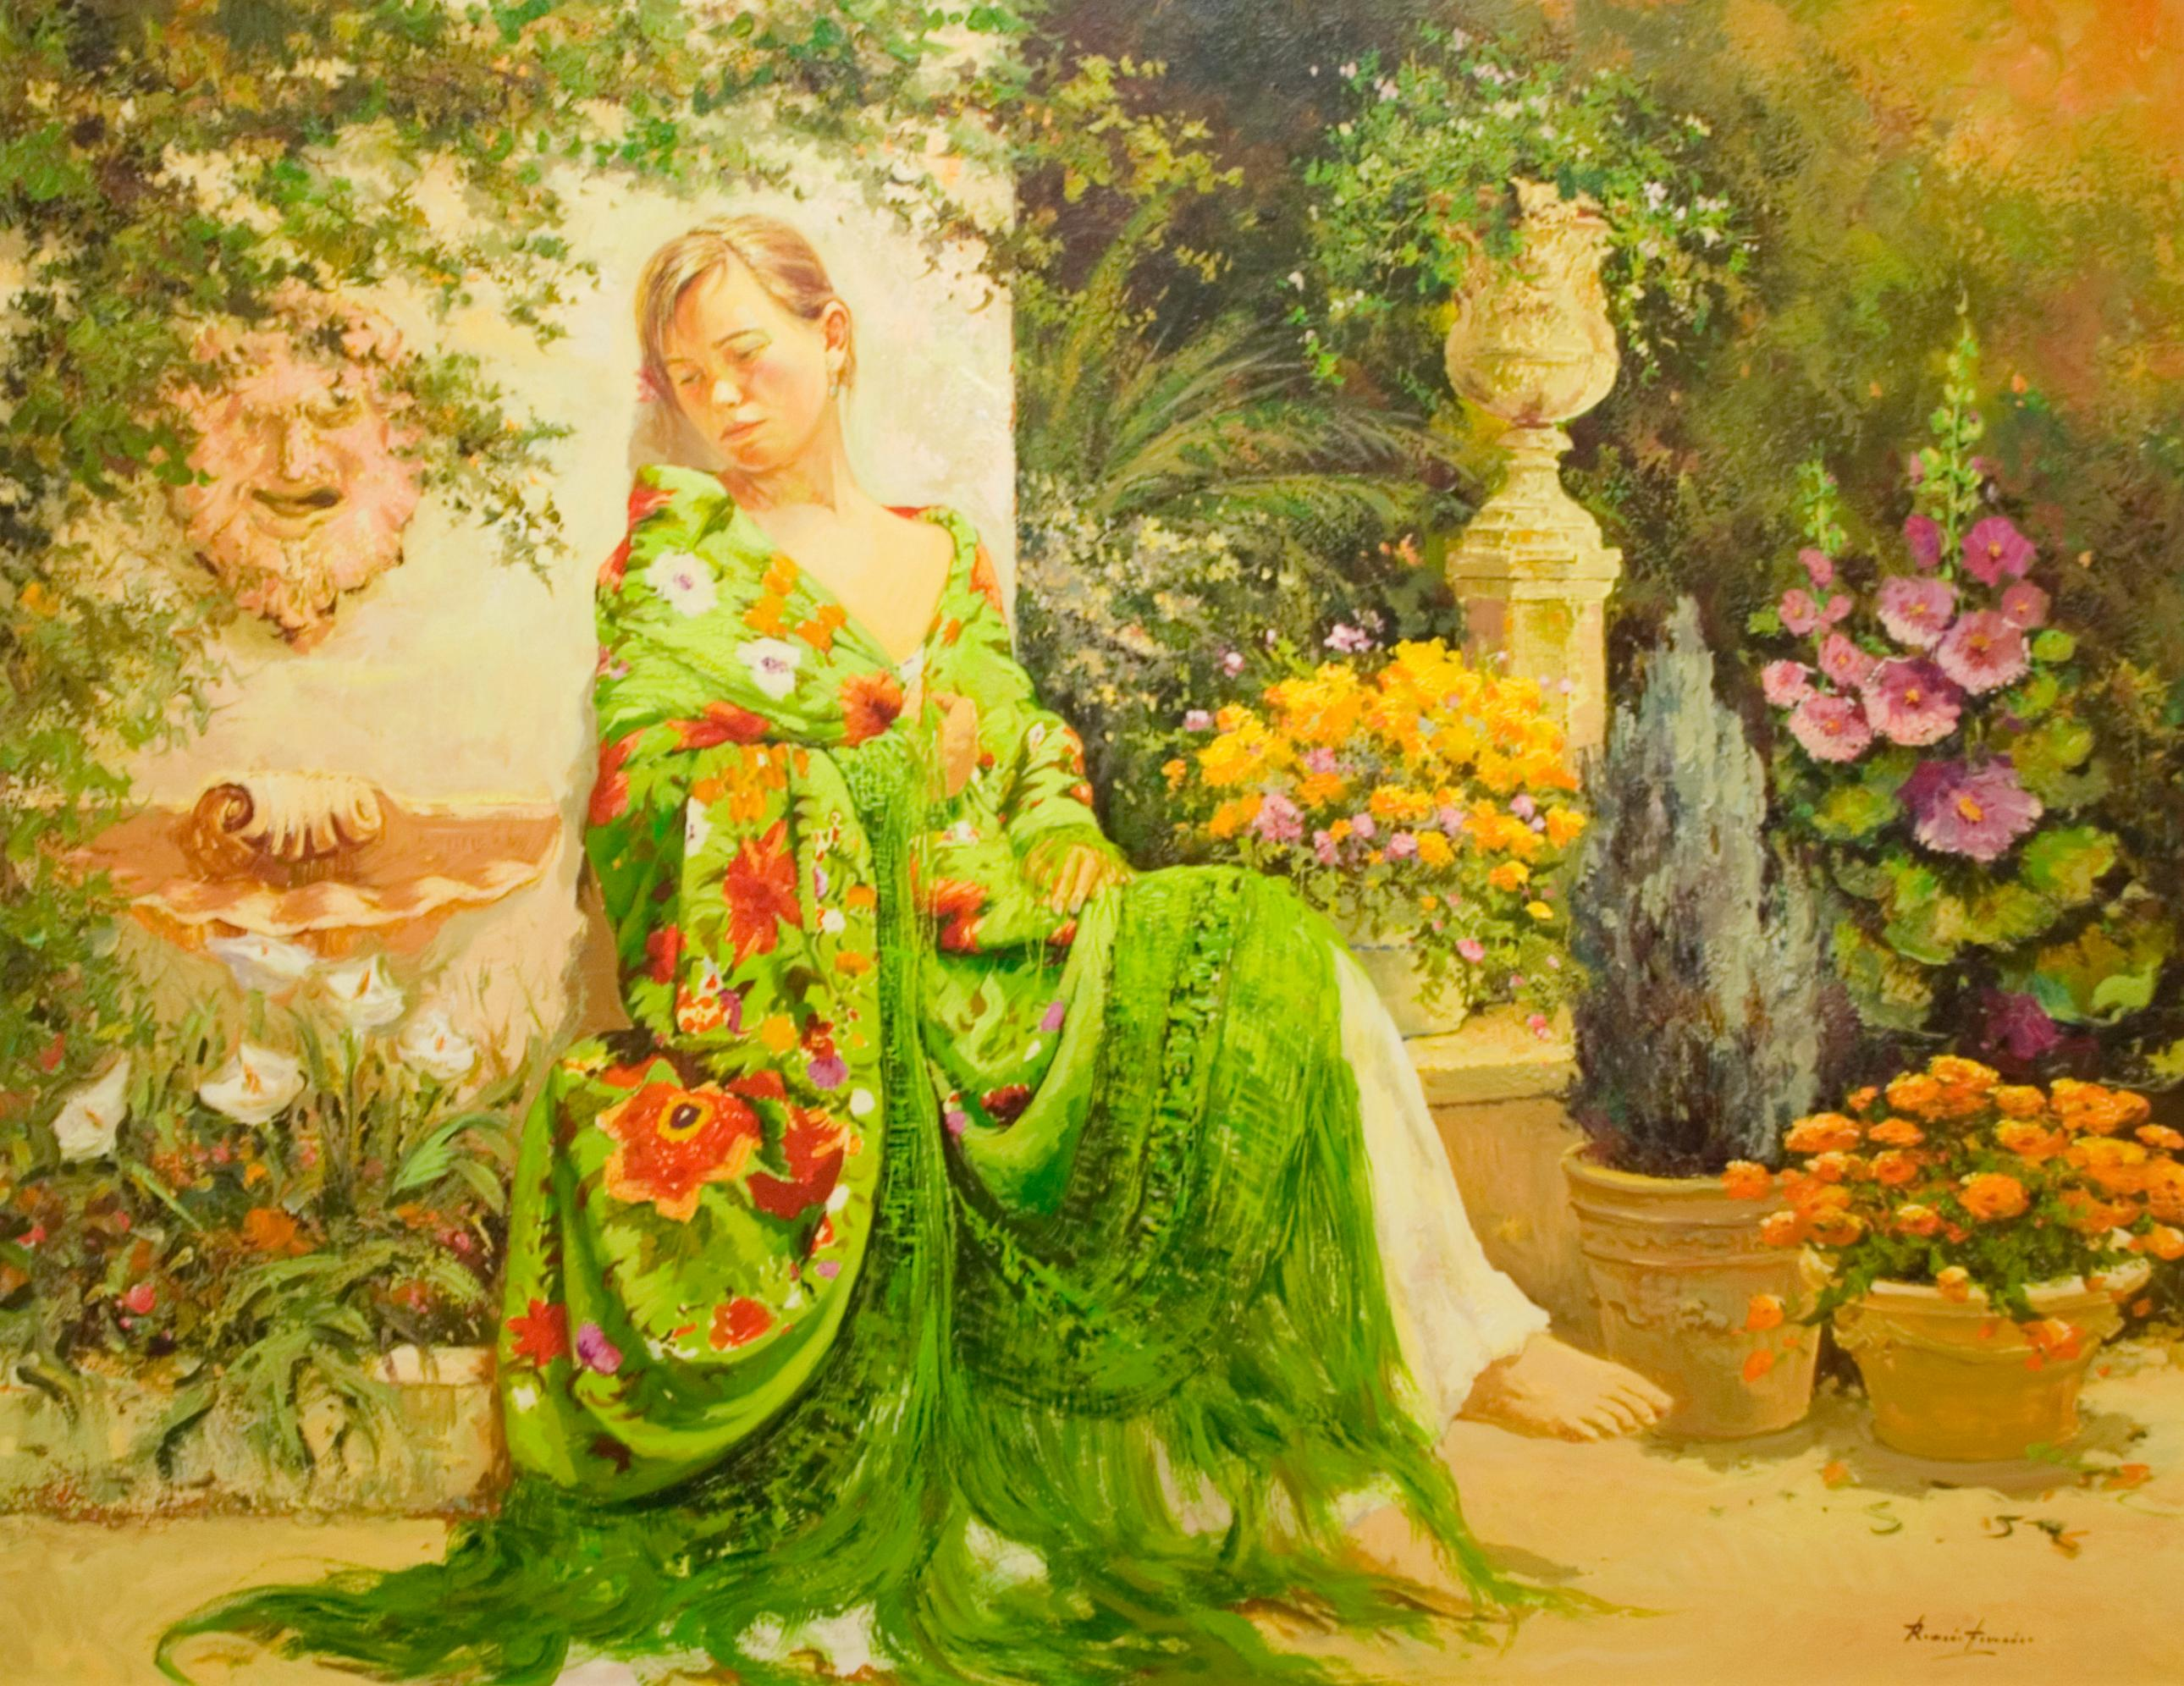 """La Bohem"" by Roman Frances 44 x 57  inch Oil on Canvas"